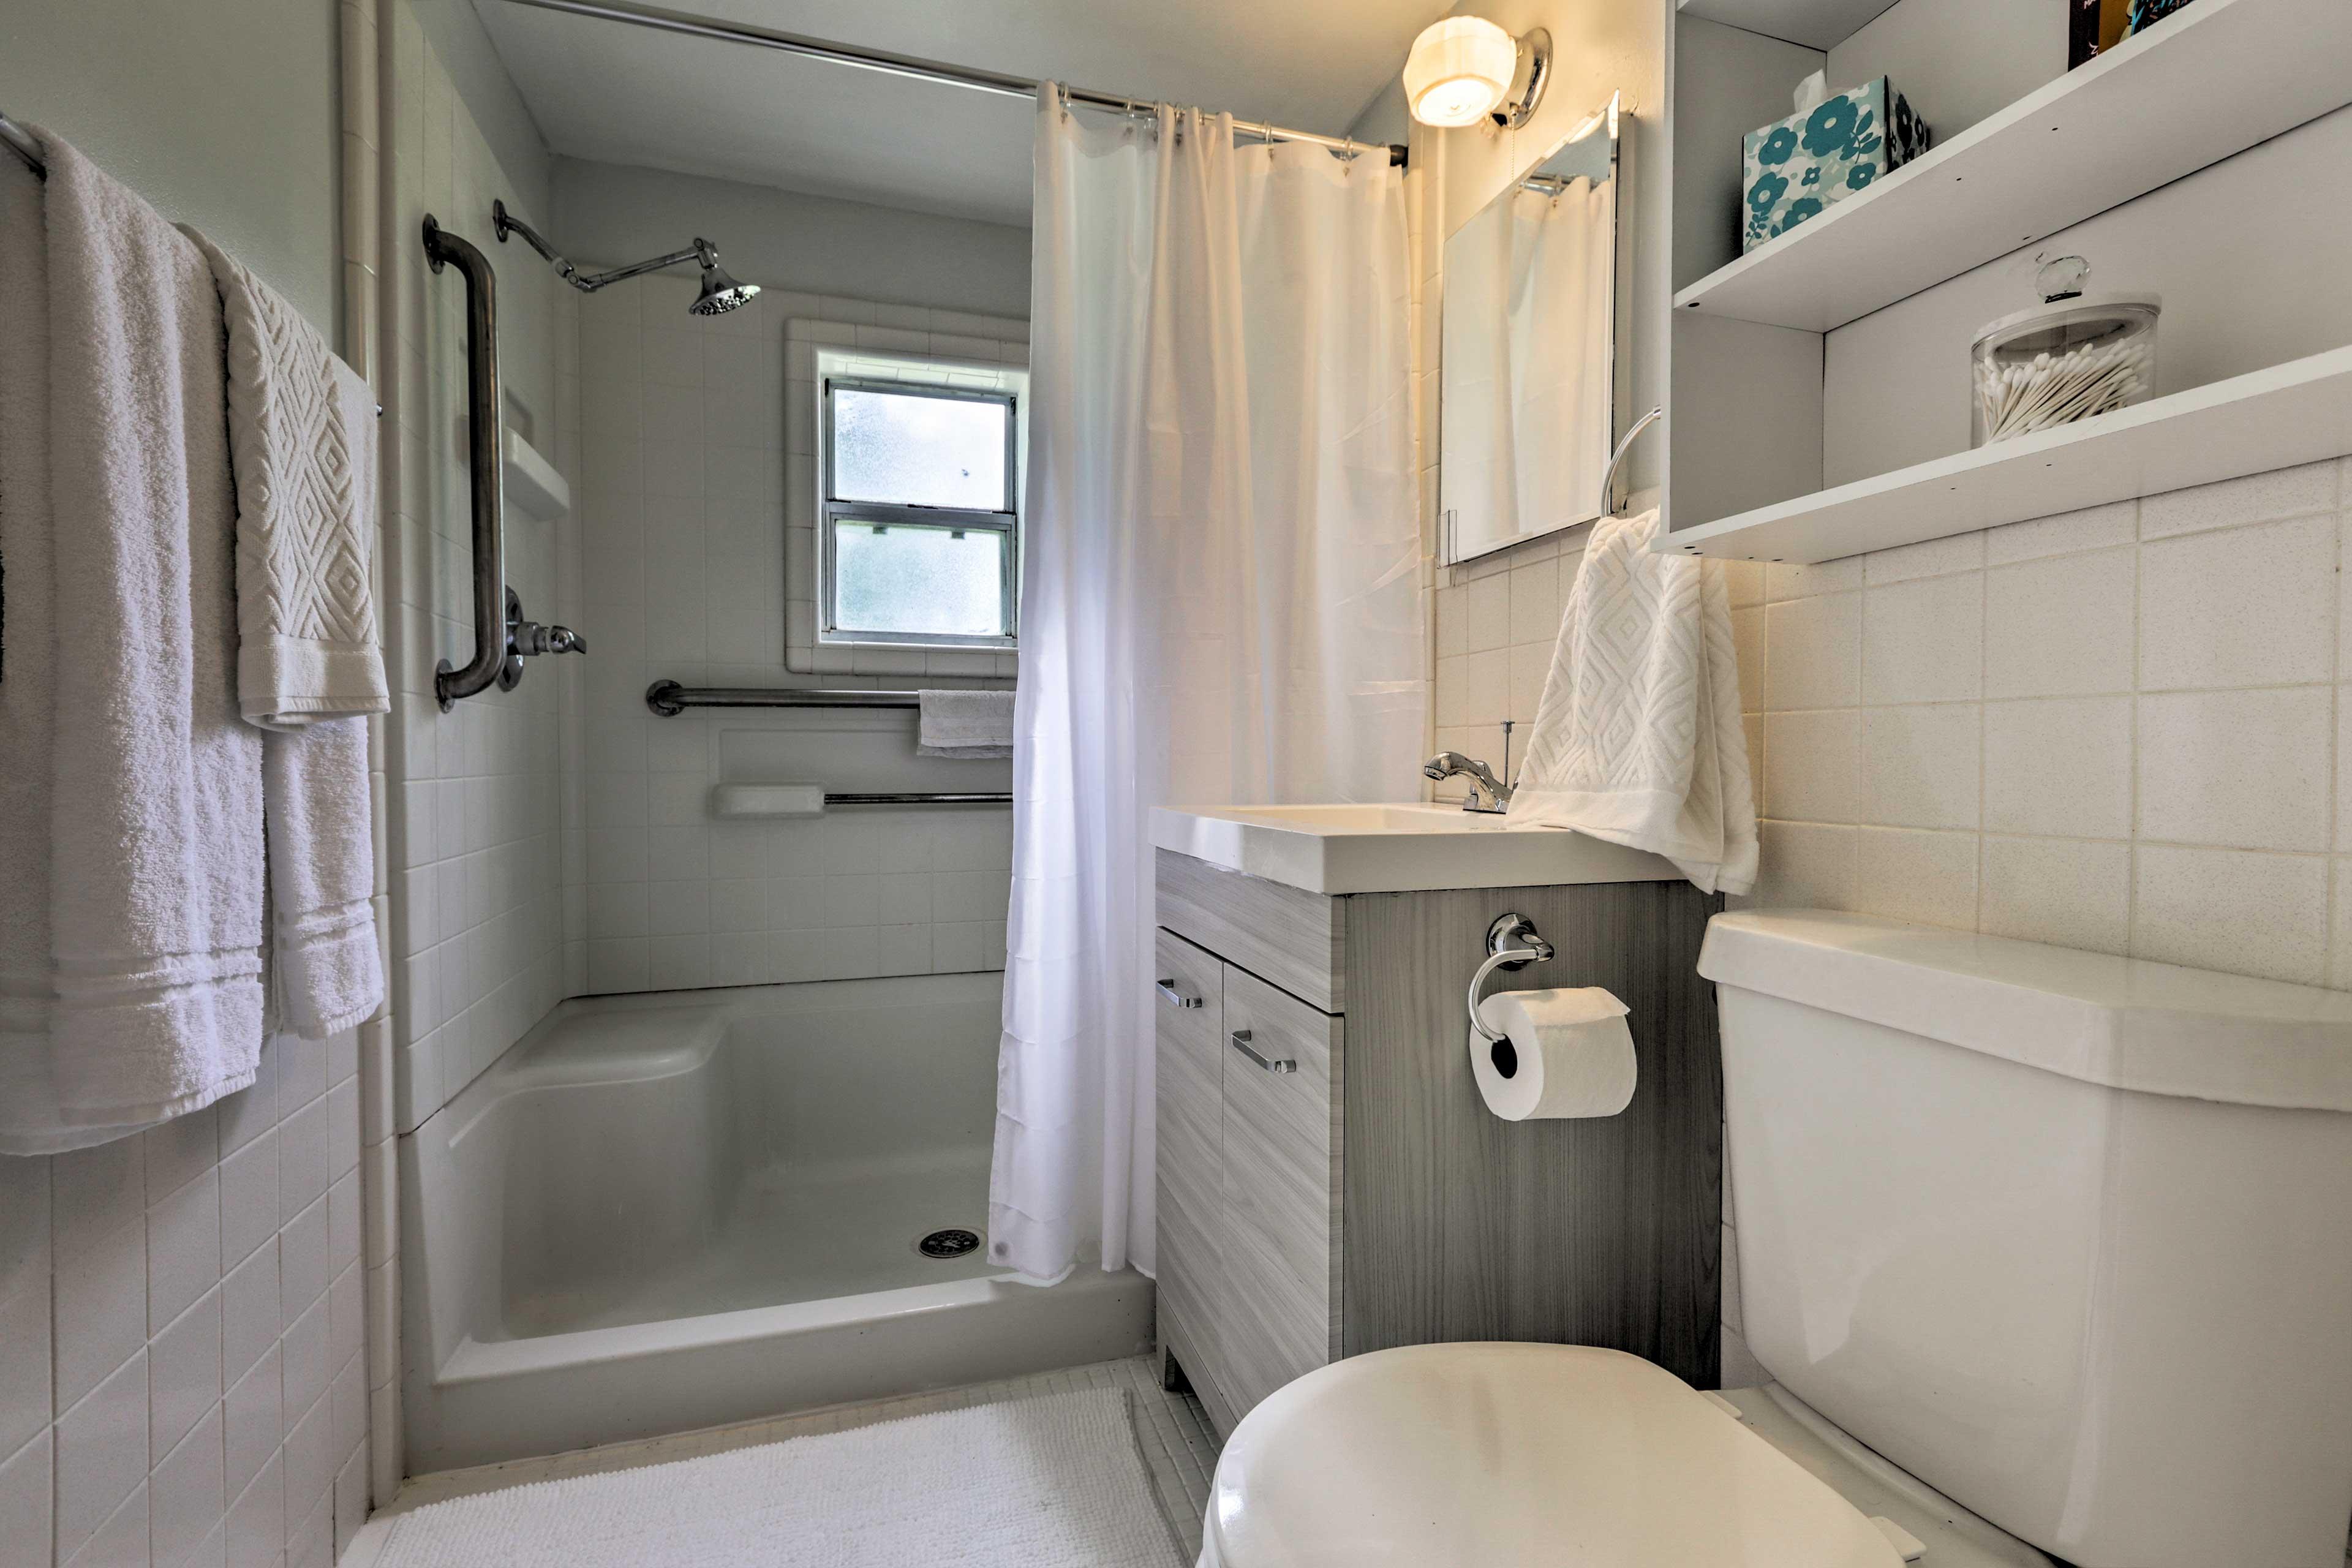 Rinse off under the walk-in shower.